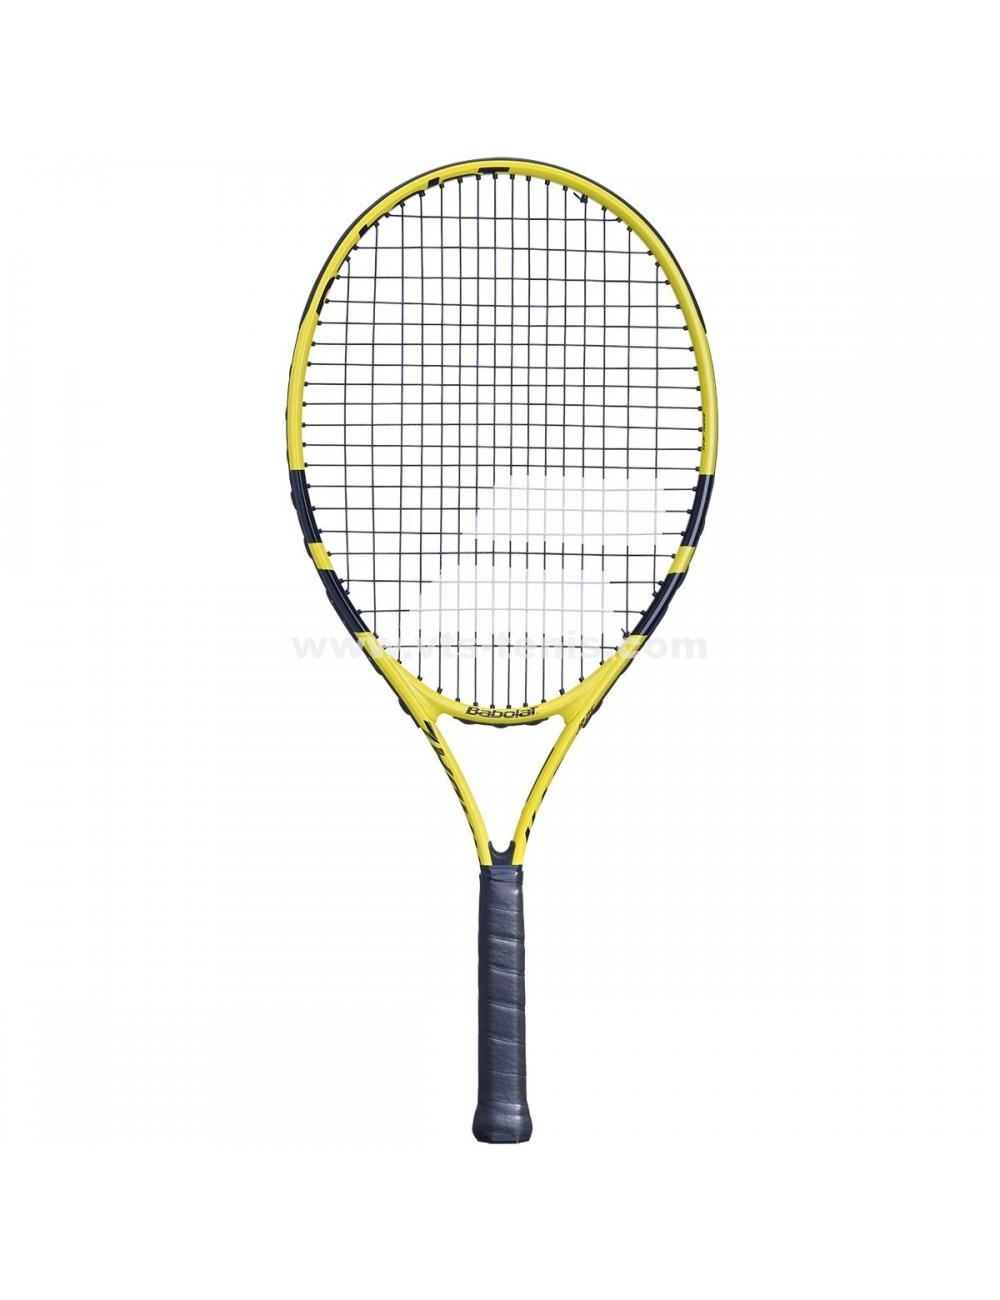 956b971da Raqueta Babolat Nadal JR 25 Grip jr Grip 0